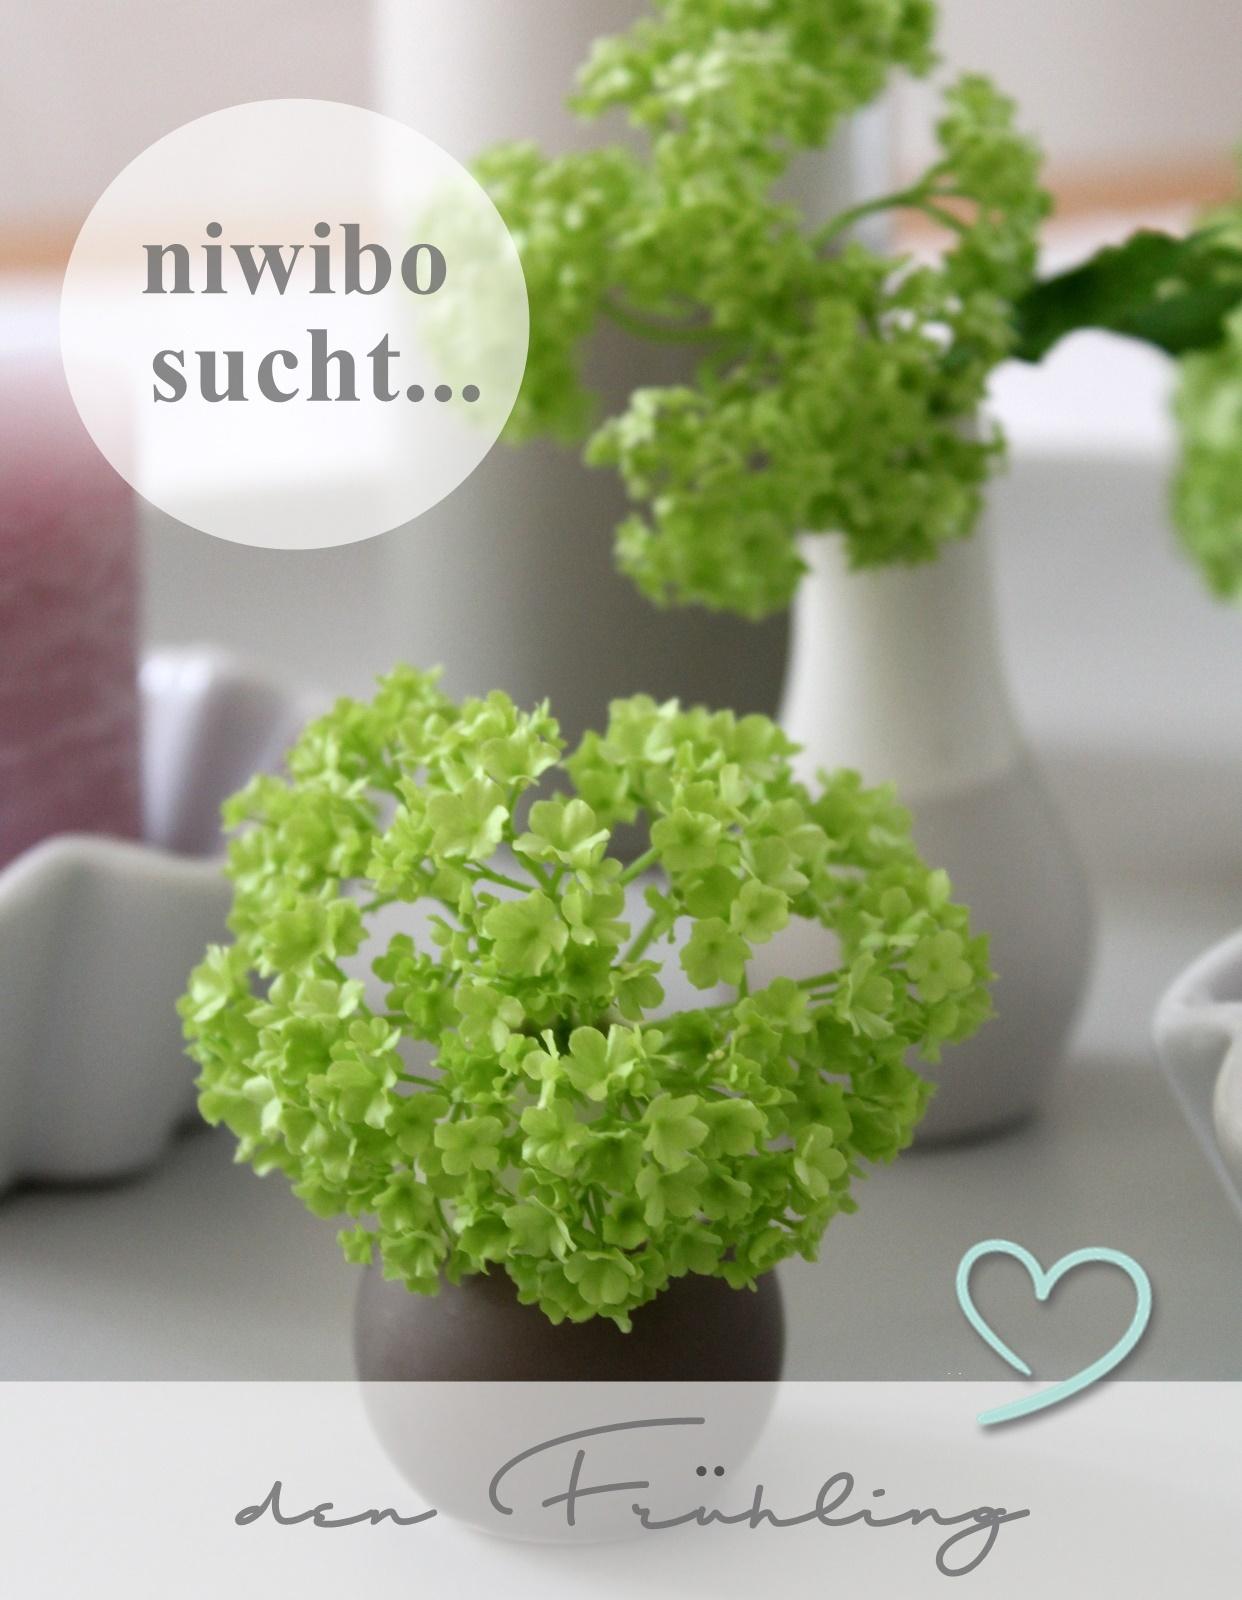 niwibo sucht . . .